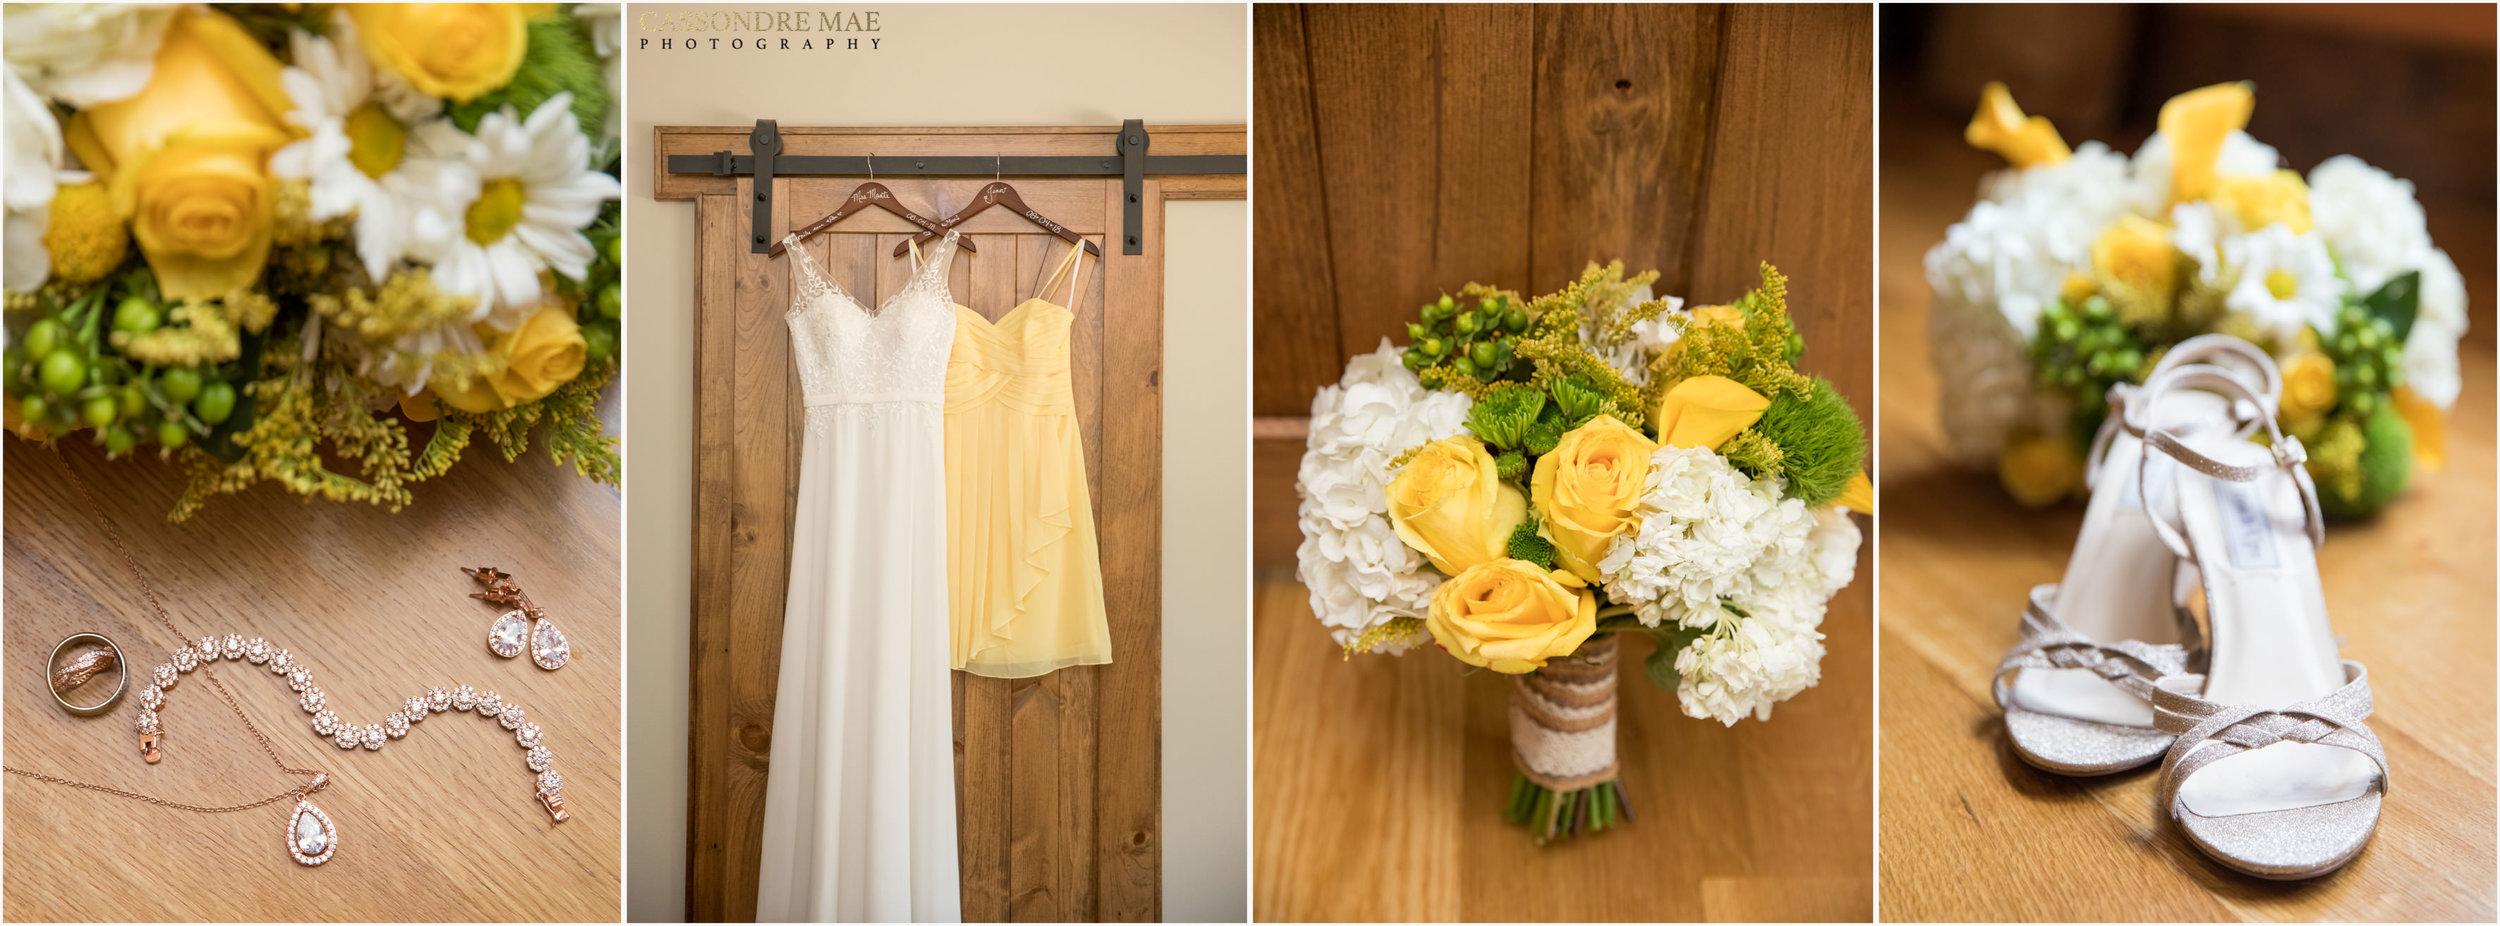 Cassondre Mae Photography Warwick NY Wedding Photographer -1.jpg